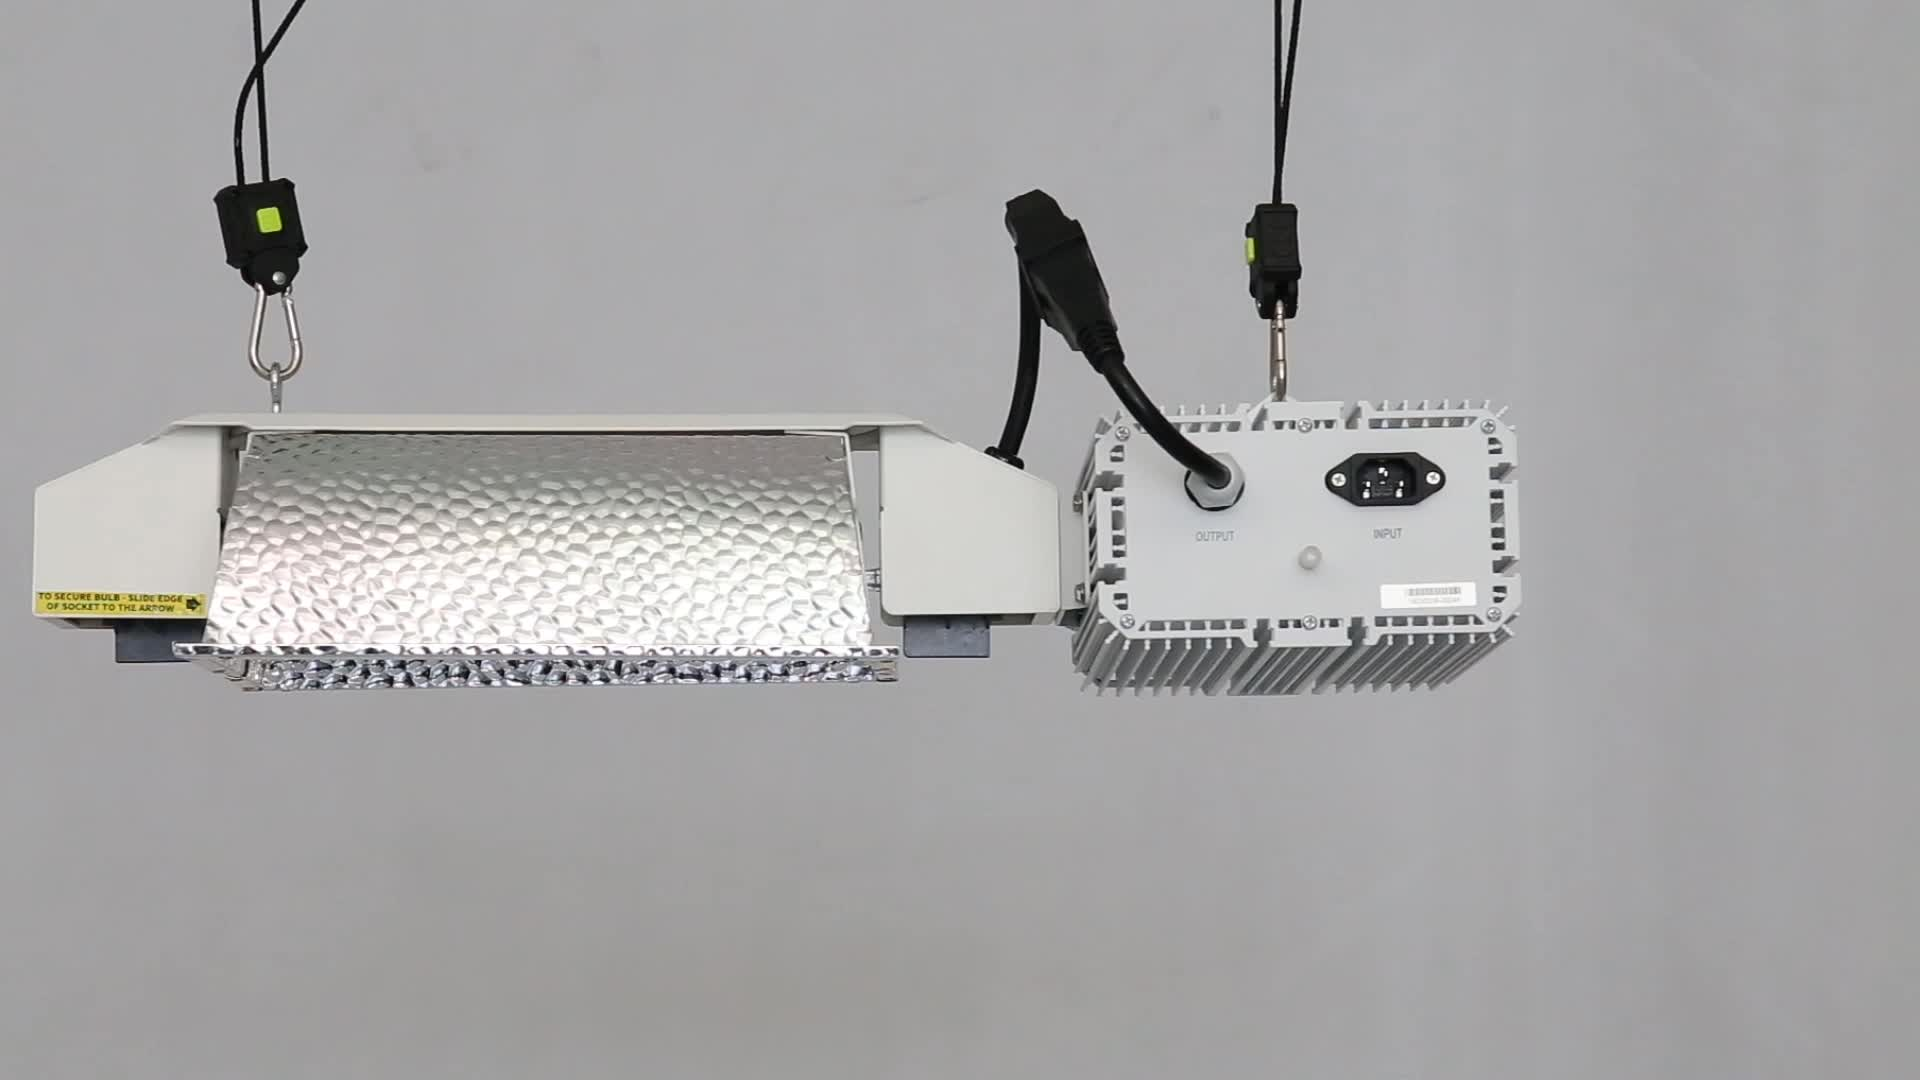 Energy Efficient Flexstar Integrated Adjustable Double Ended 945w CMH Fixture